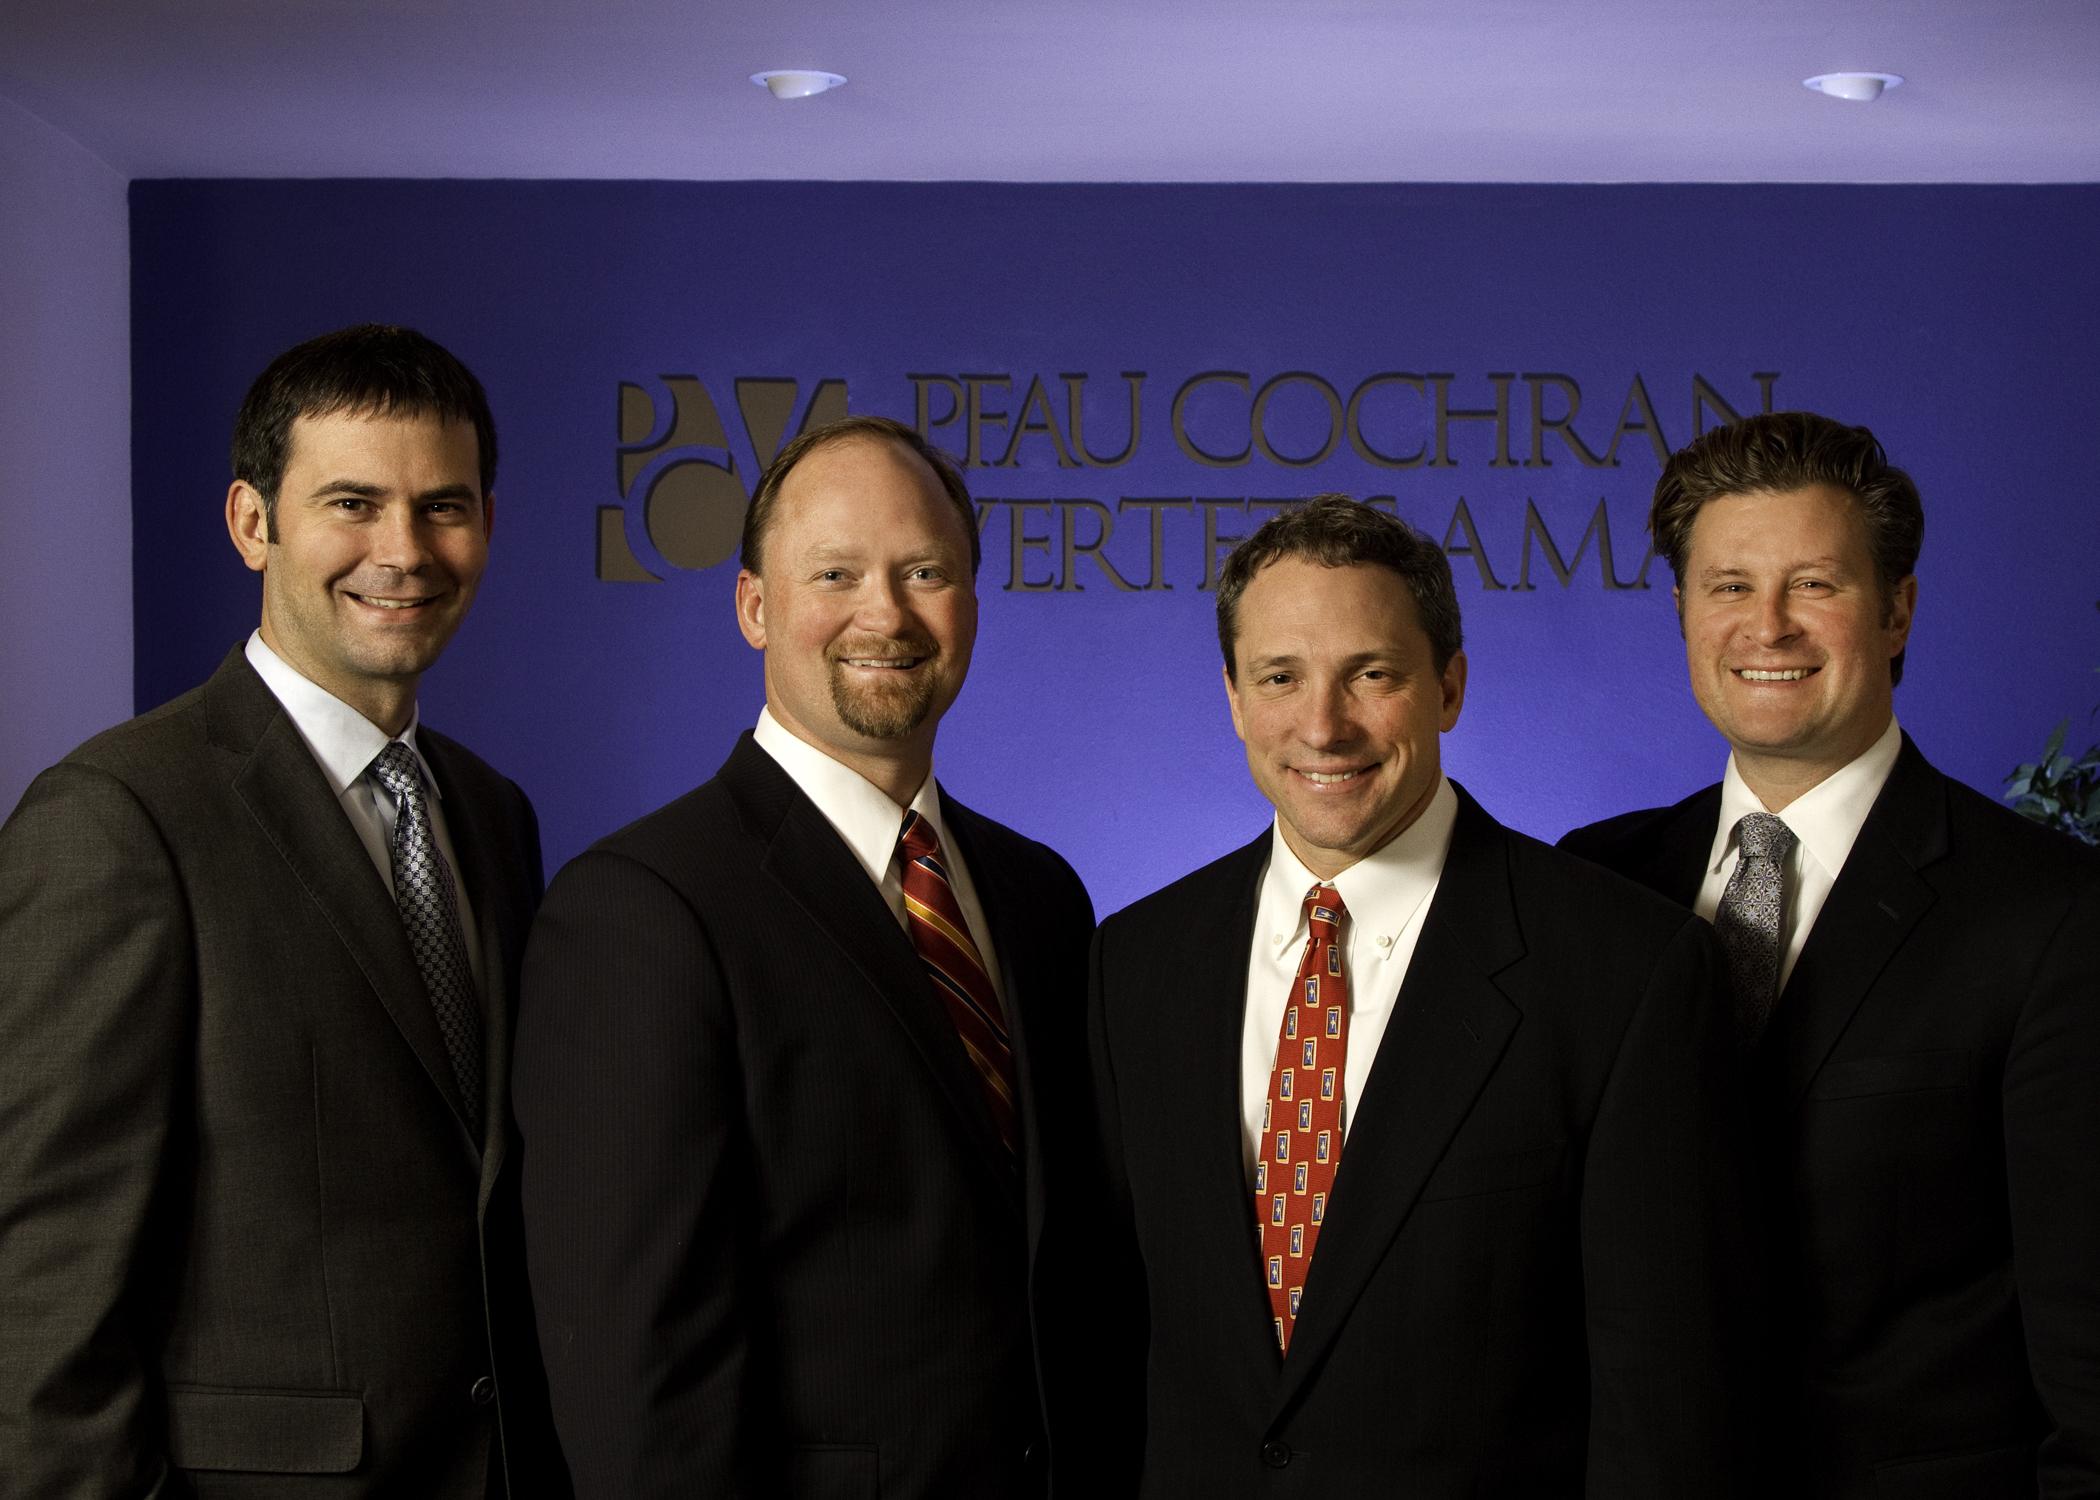 PCVA Partners